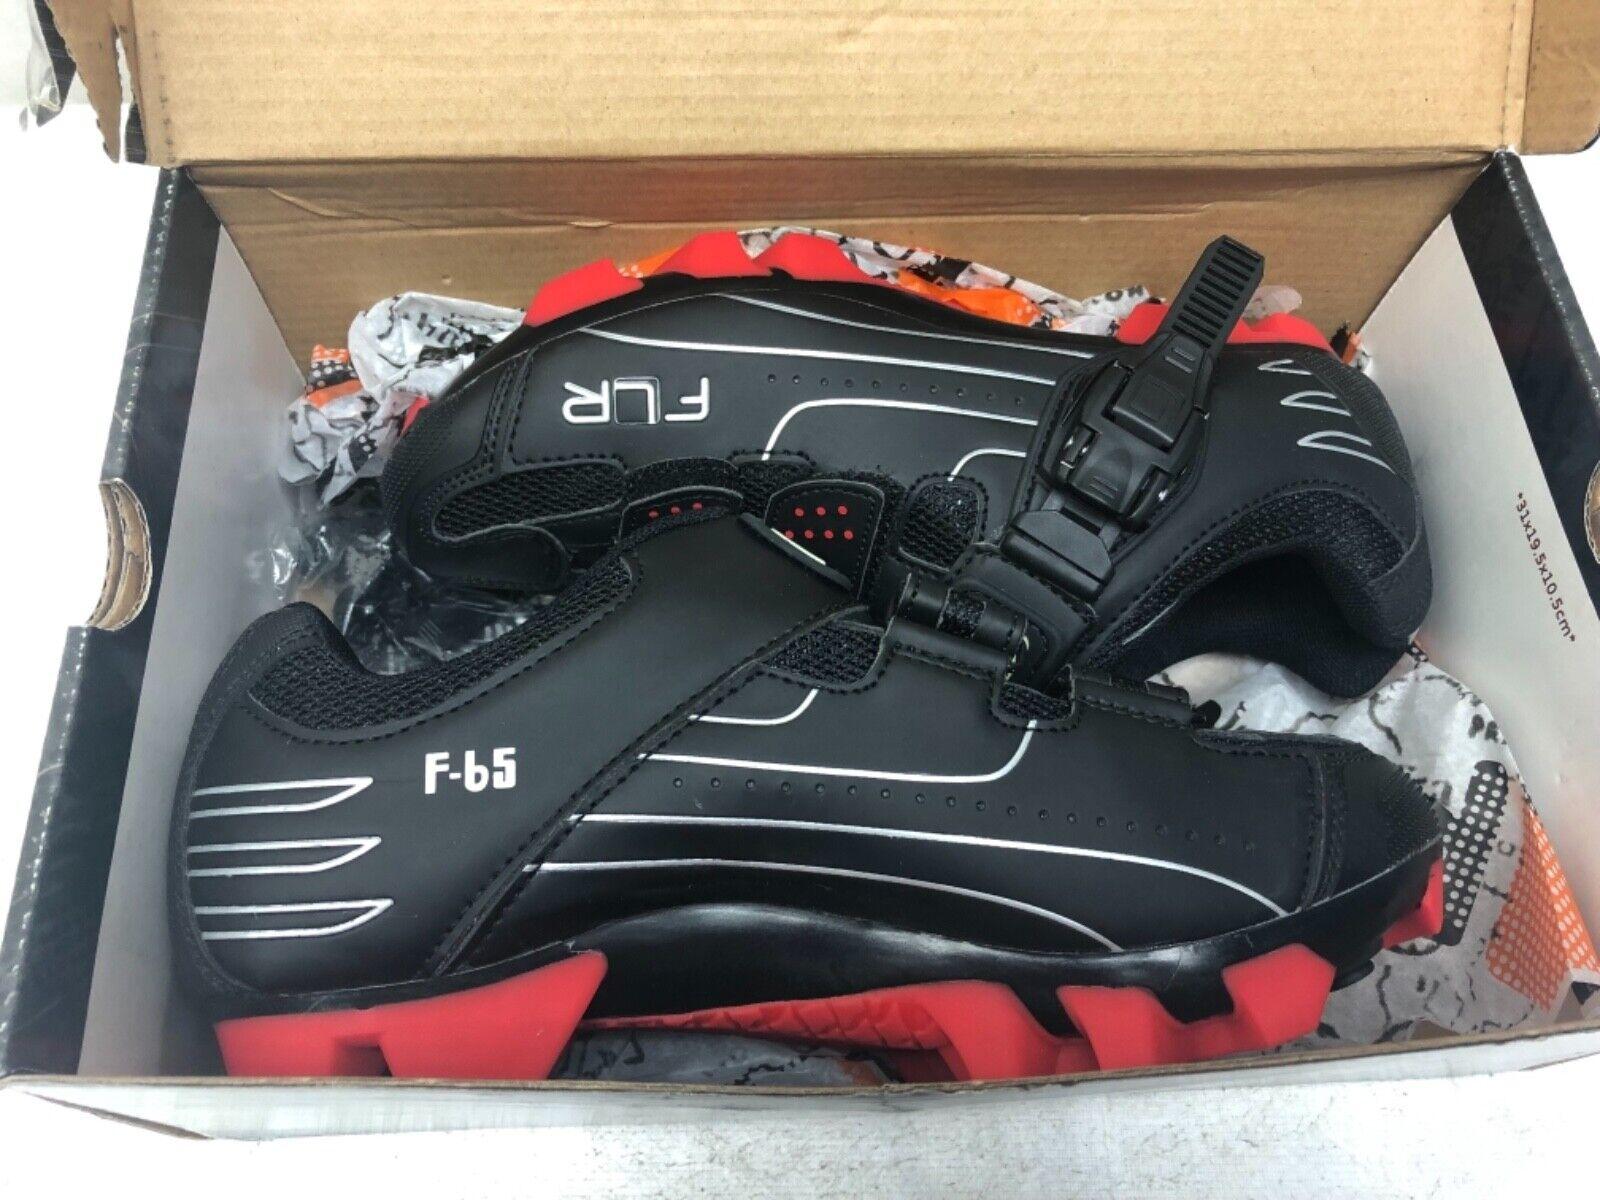 FLR F-65 Calzado Calzado Calzado para Ciclismo MTB Negro Para Hombre II 's Woman's (tamaño de Reino Unido 6.5, EU 40) 2a30a4